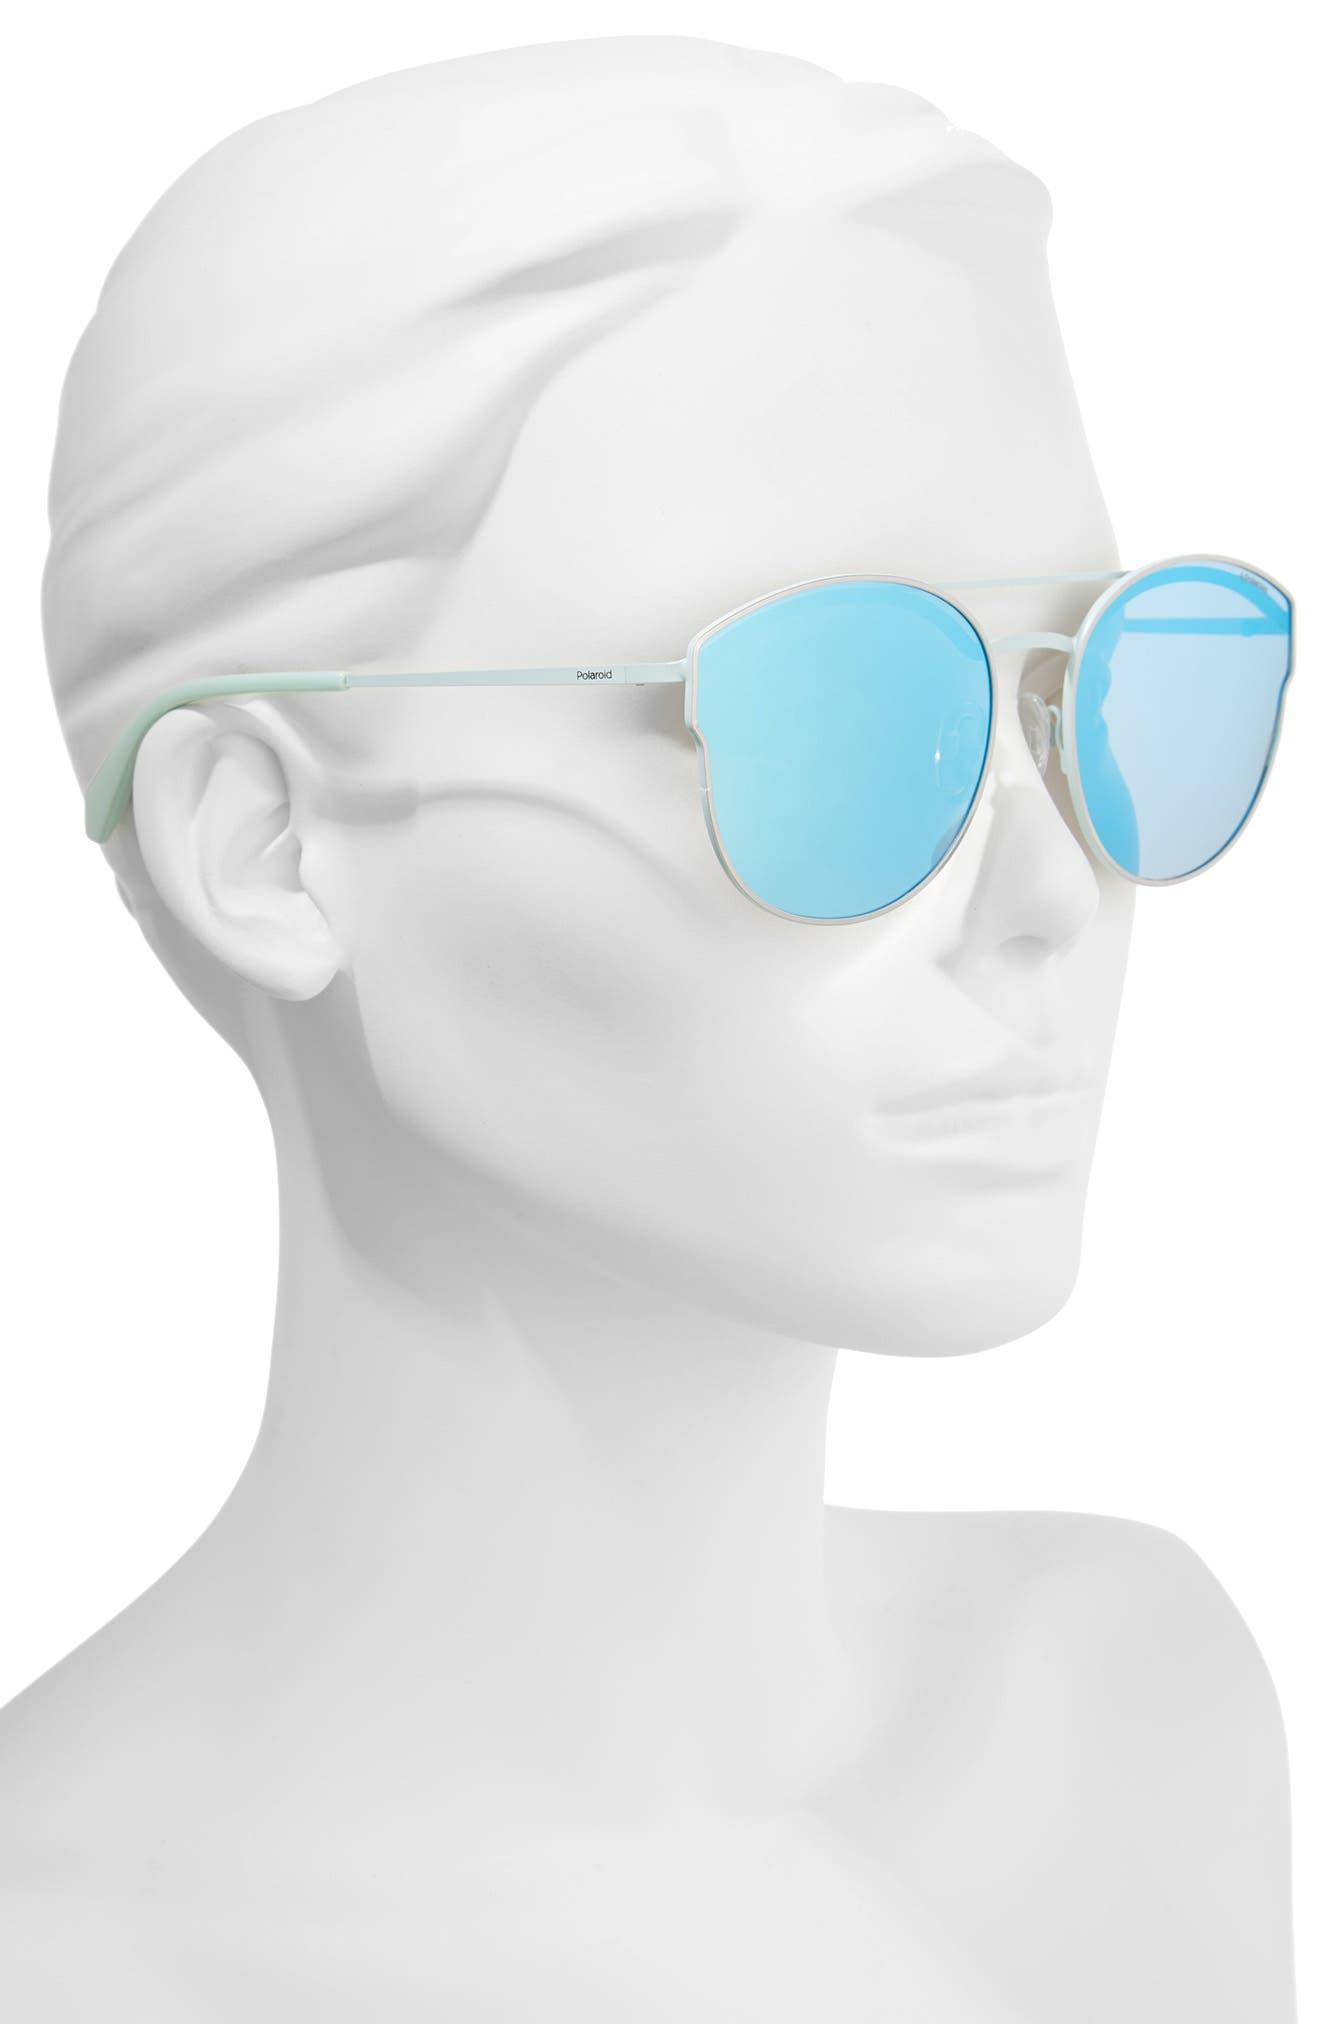 60mm Polarized Round Aviator Sunglasses,                             Alternate thumbnail 3, color,                             Ruthenium